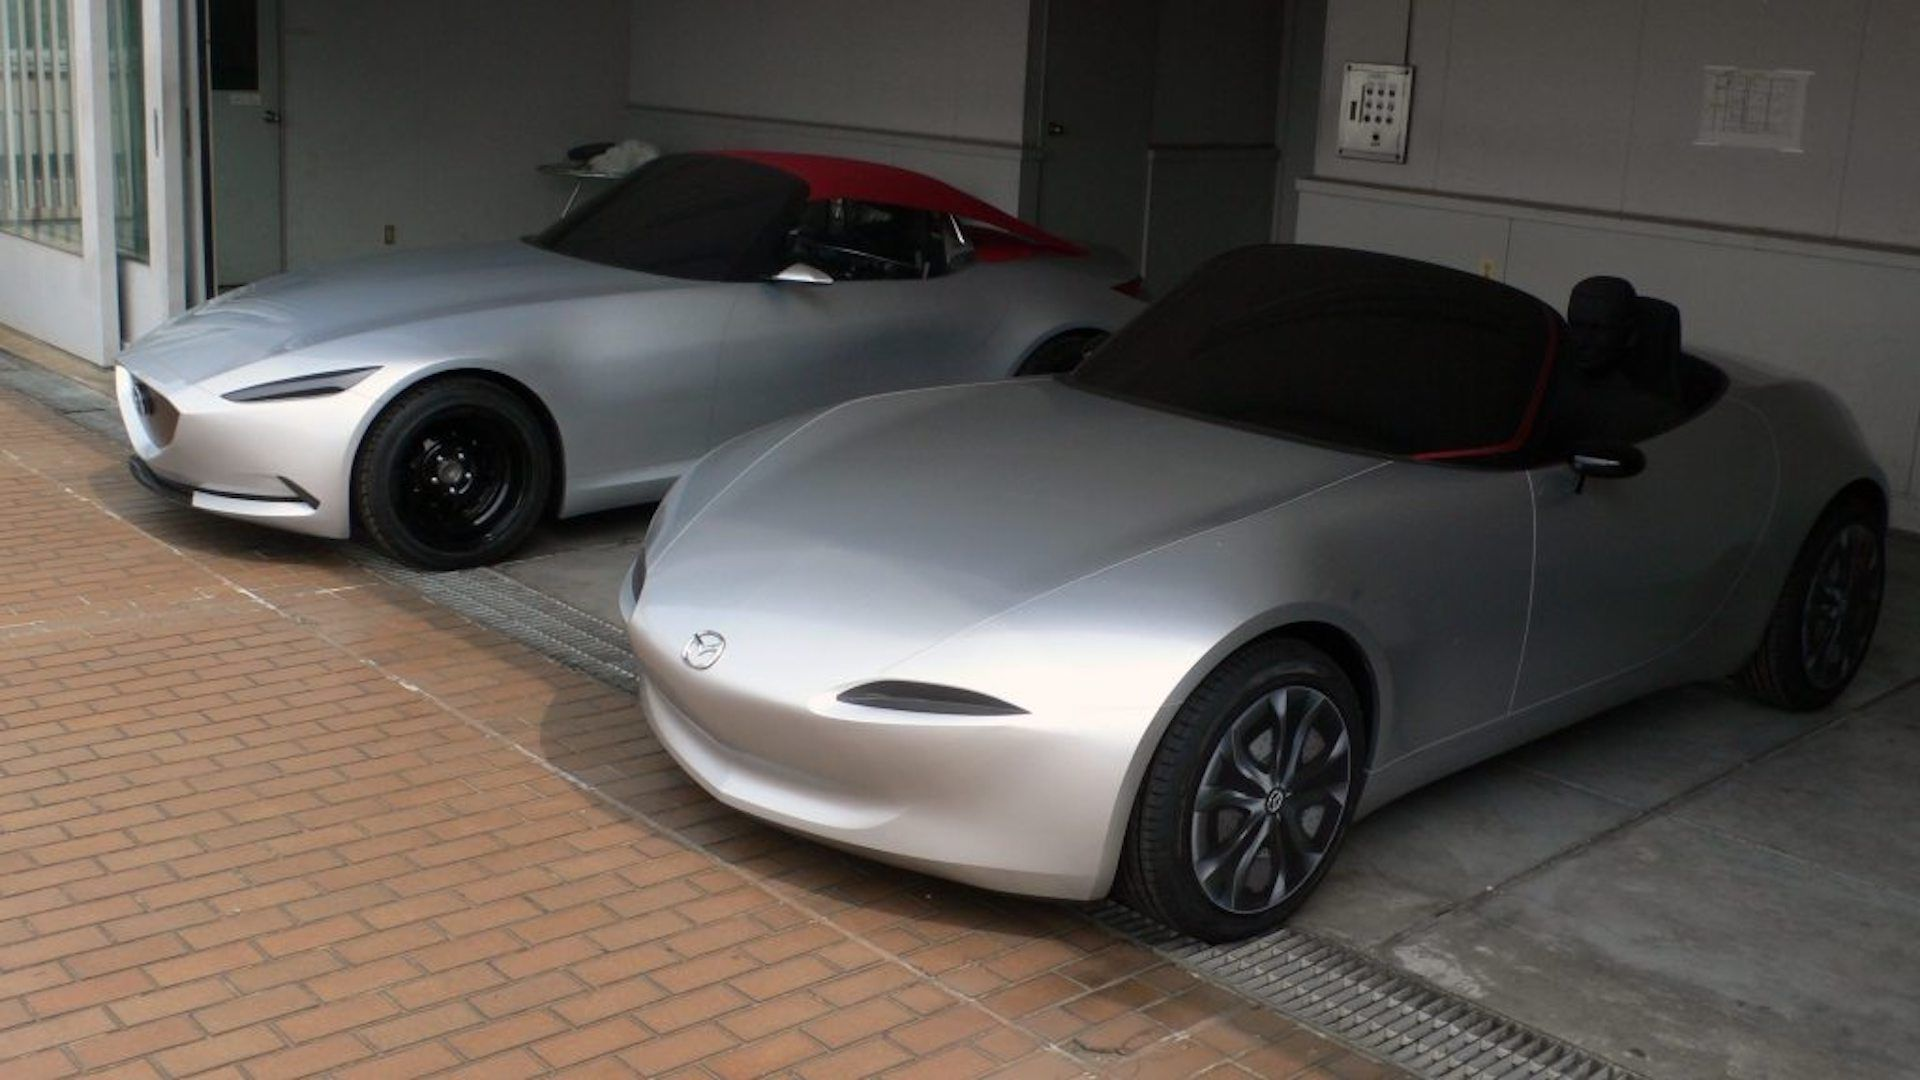 2020 Mazda Mx 5 Price And Release Date Mazda Mx5 Miata Mazda Mx5 Miata